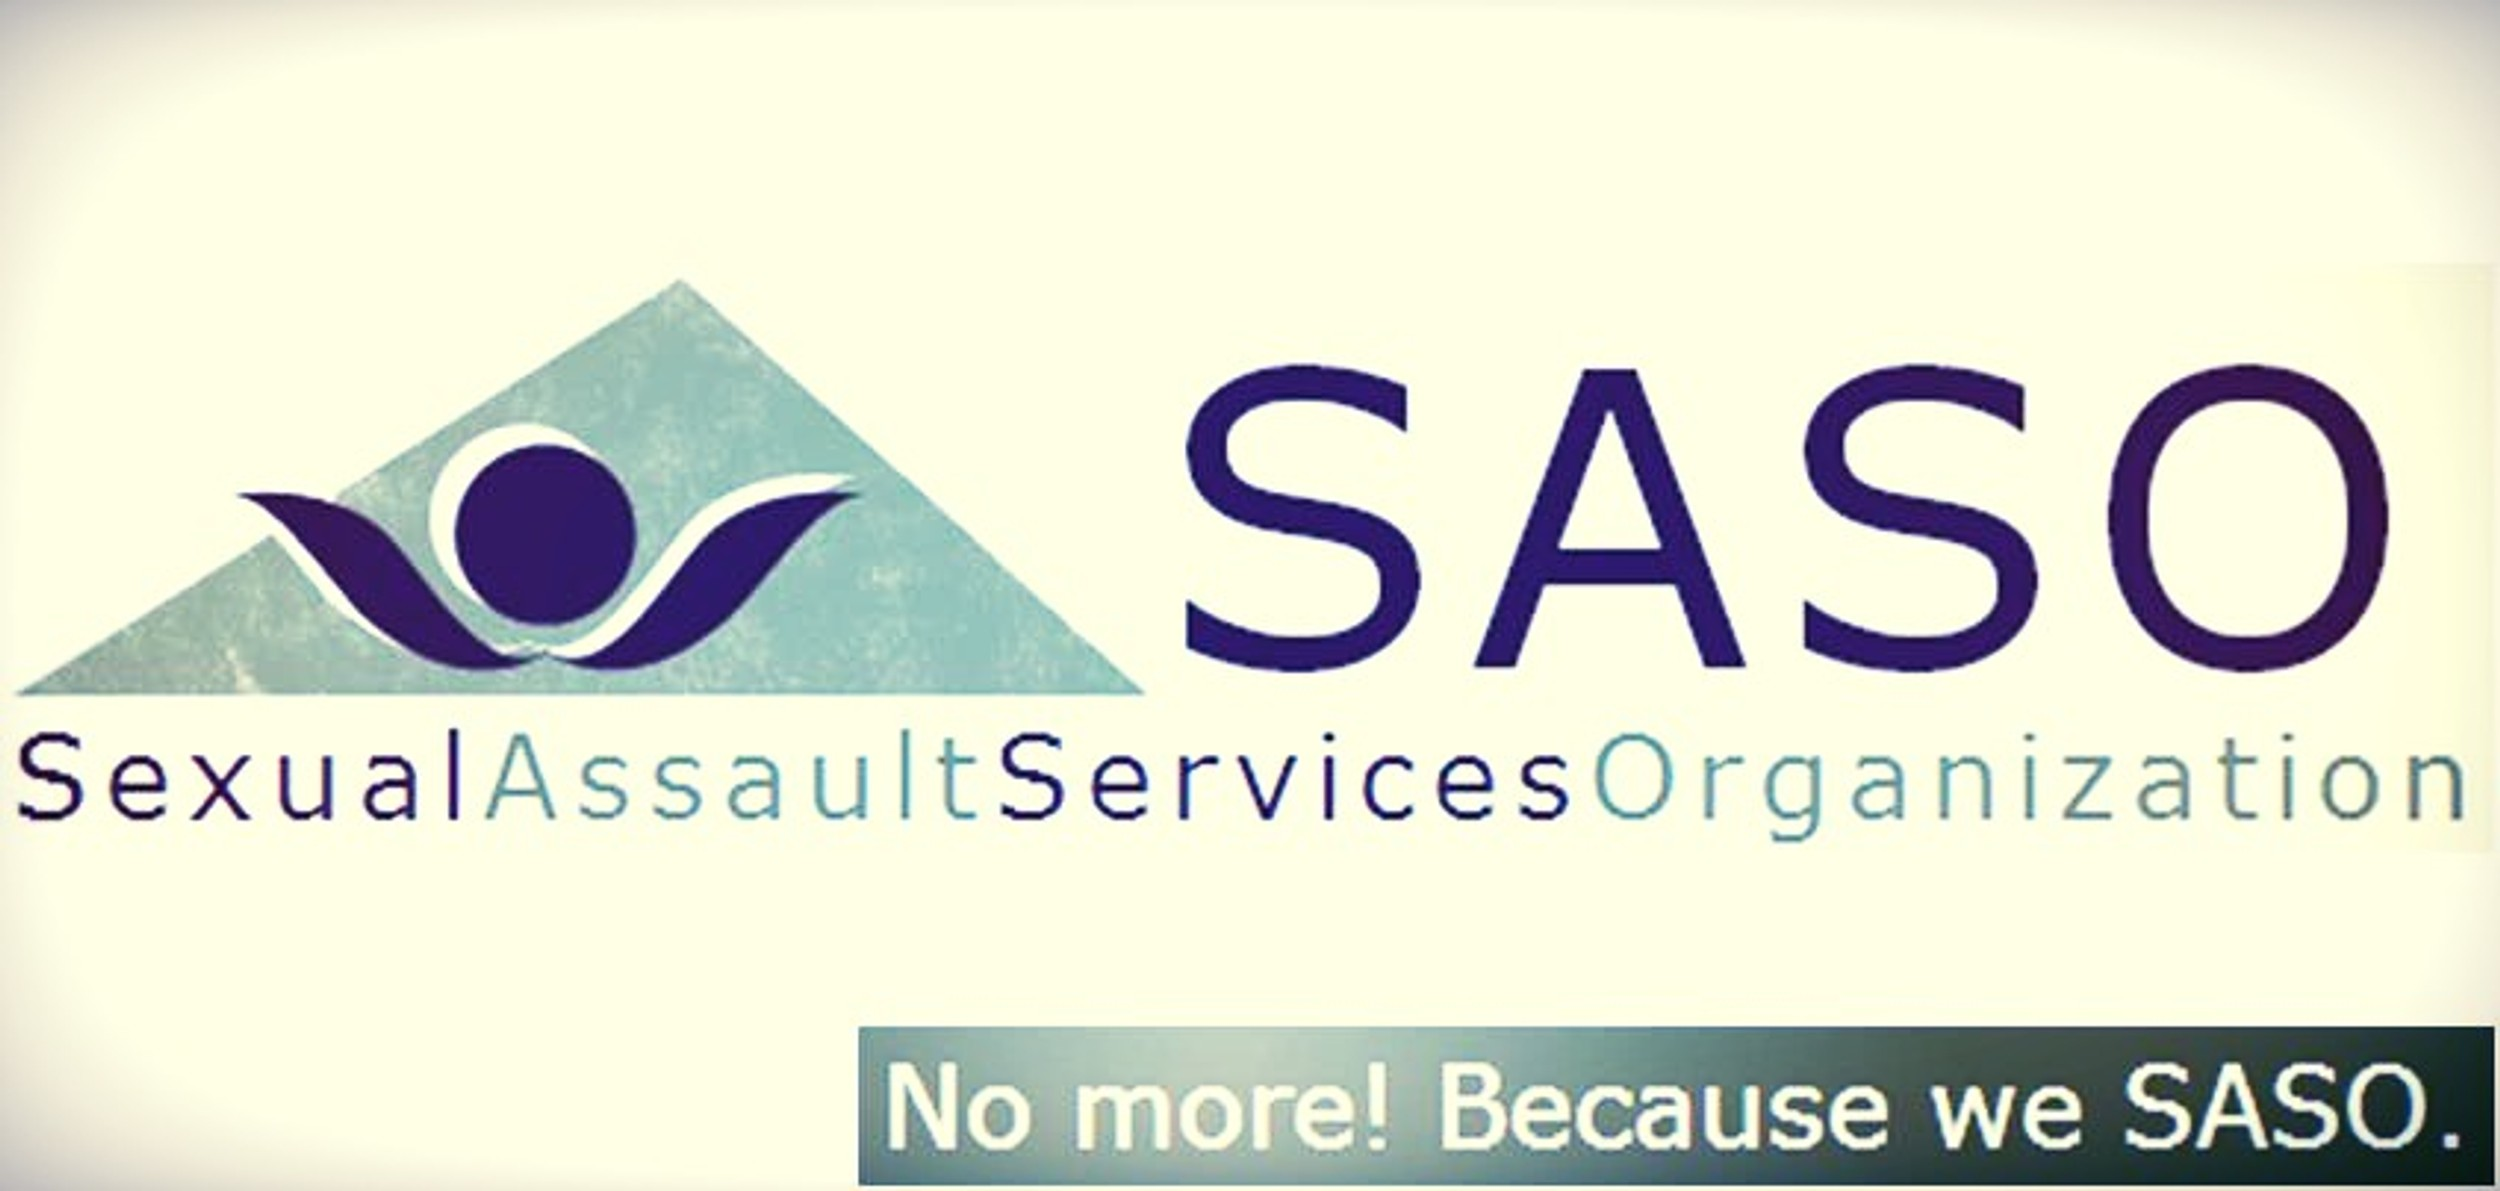 Sexual Assault Services Organization logo